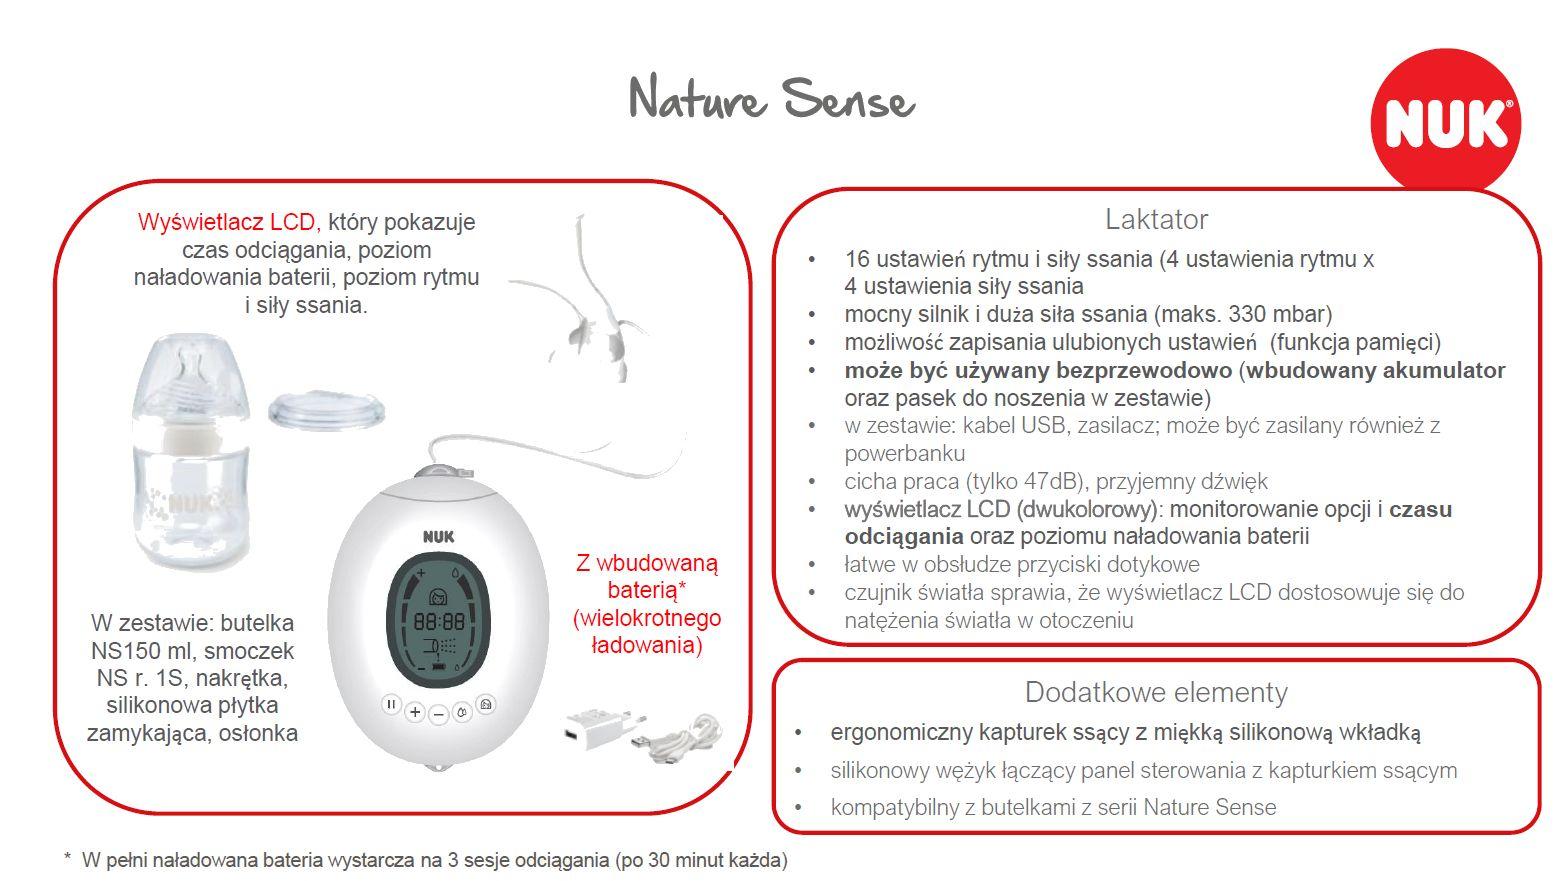 naturesenseopis.JPG